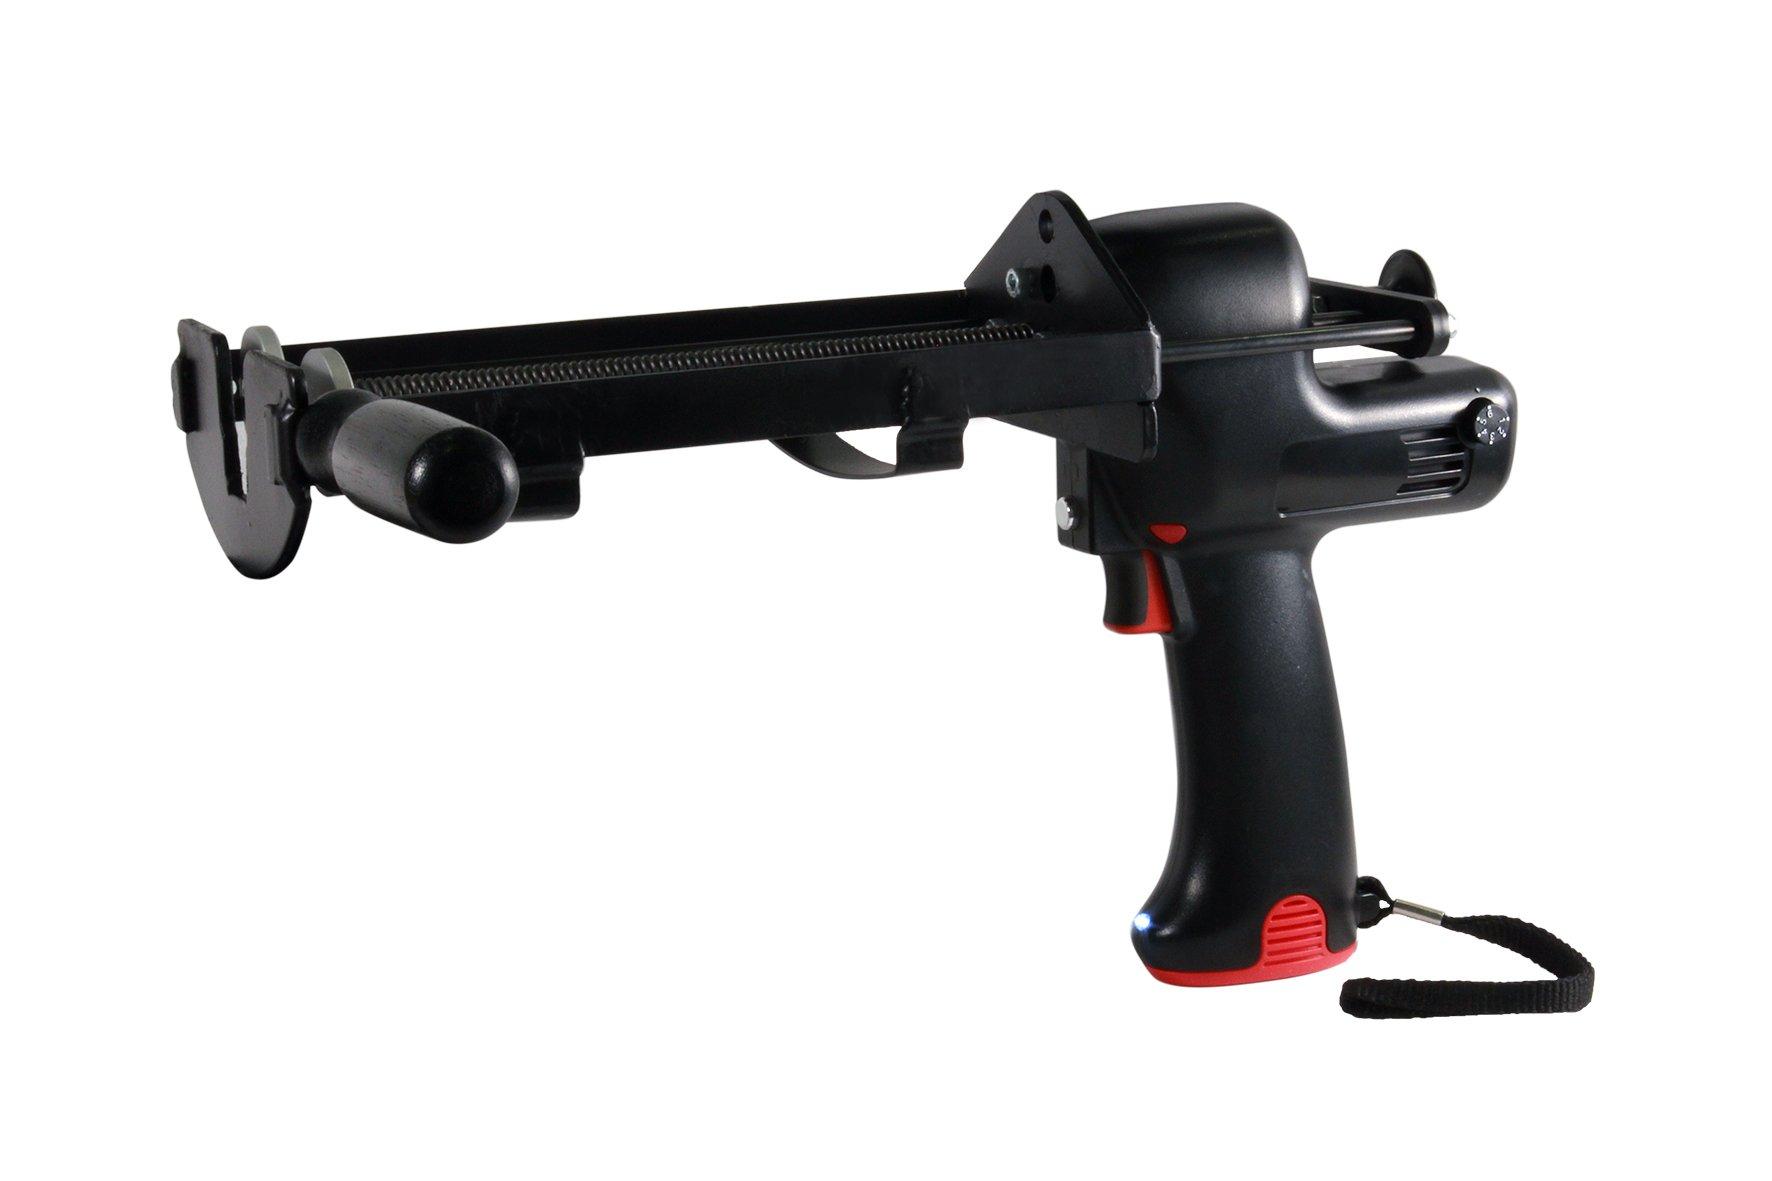 Wellmade Tools CEG-300 Dual Cartridge Battery Operated, 300ml x 300ml